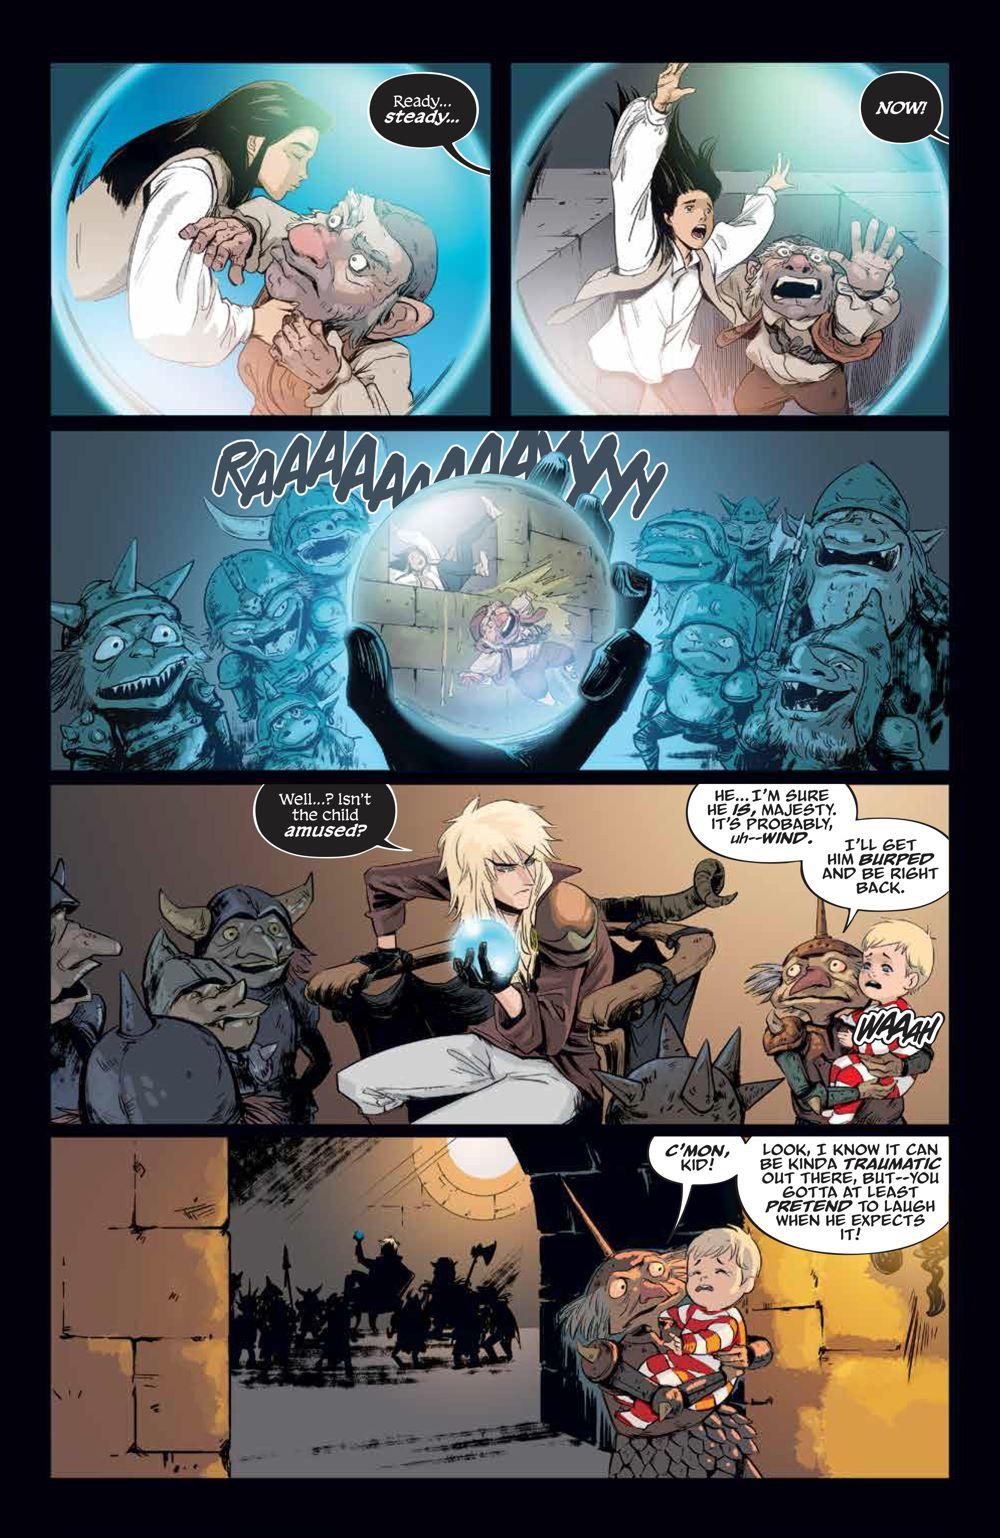 LabyrinthCoronation_v2_SC_PRESS_21 ComicList Previews: JIM HENSON'S LABYRINTH CORONATION VOLUME 2 TP